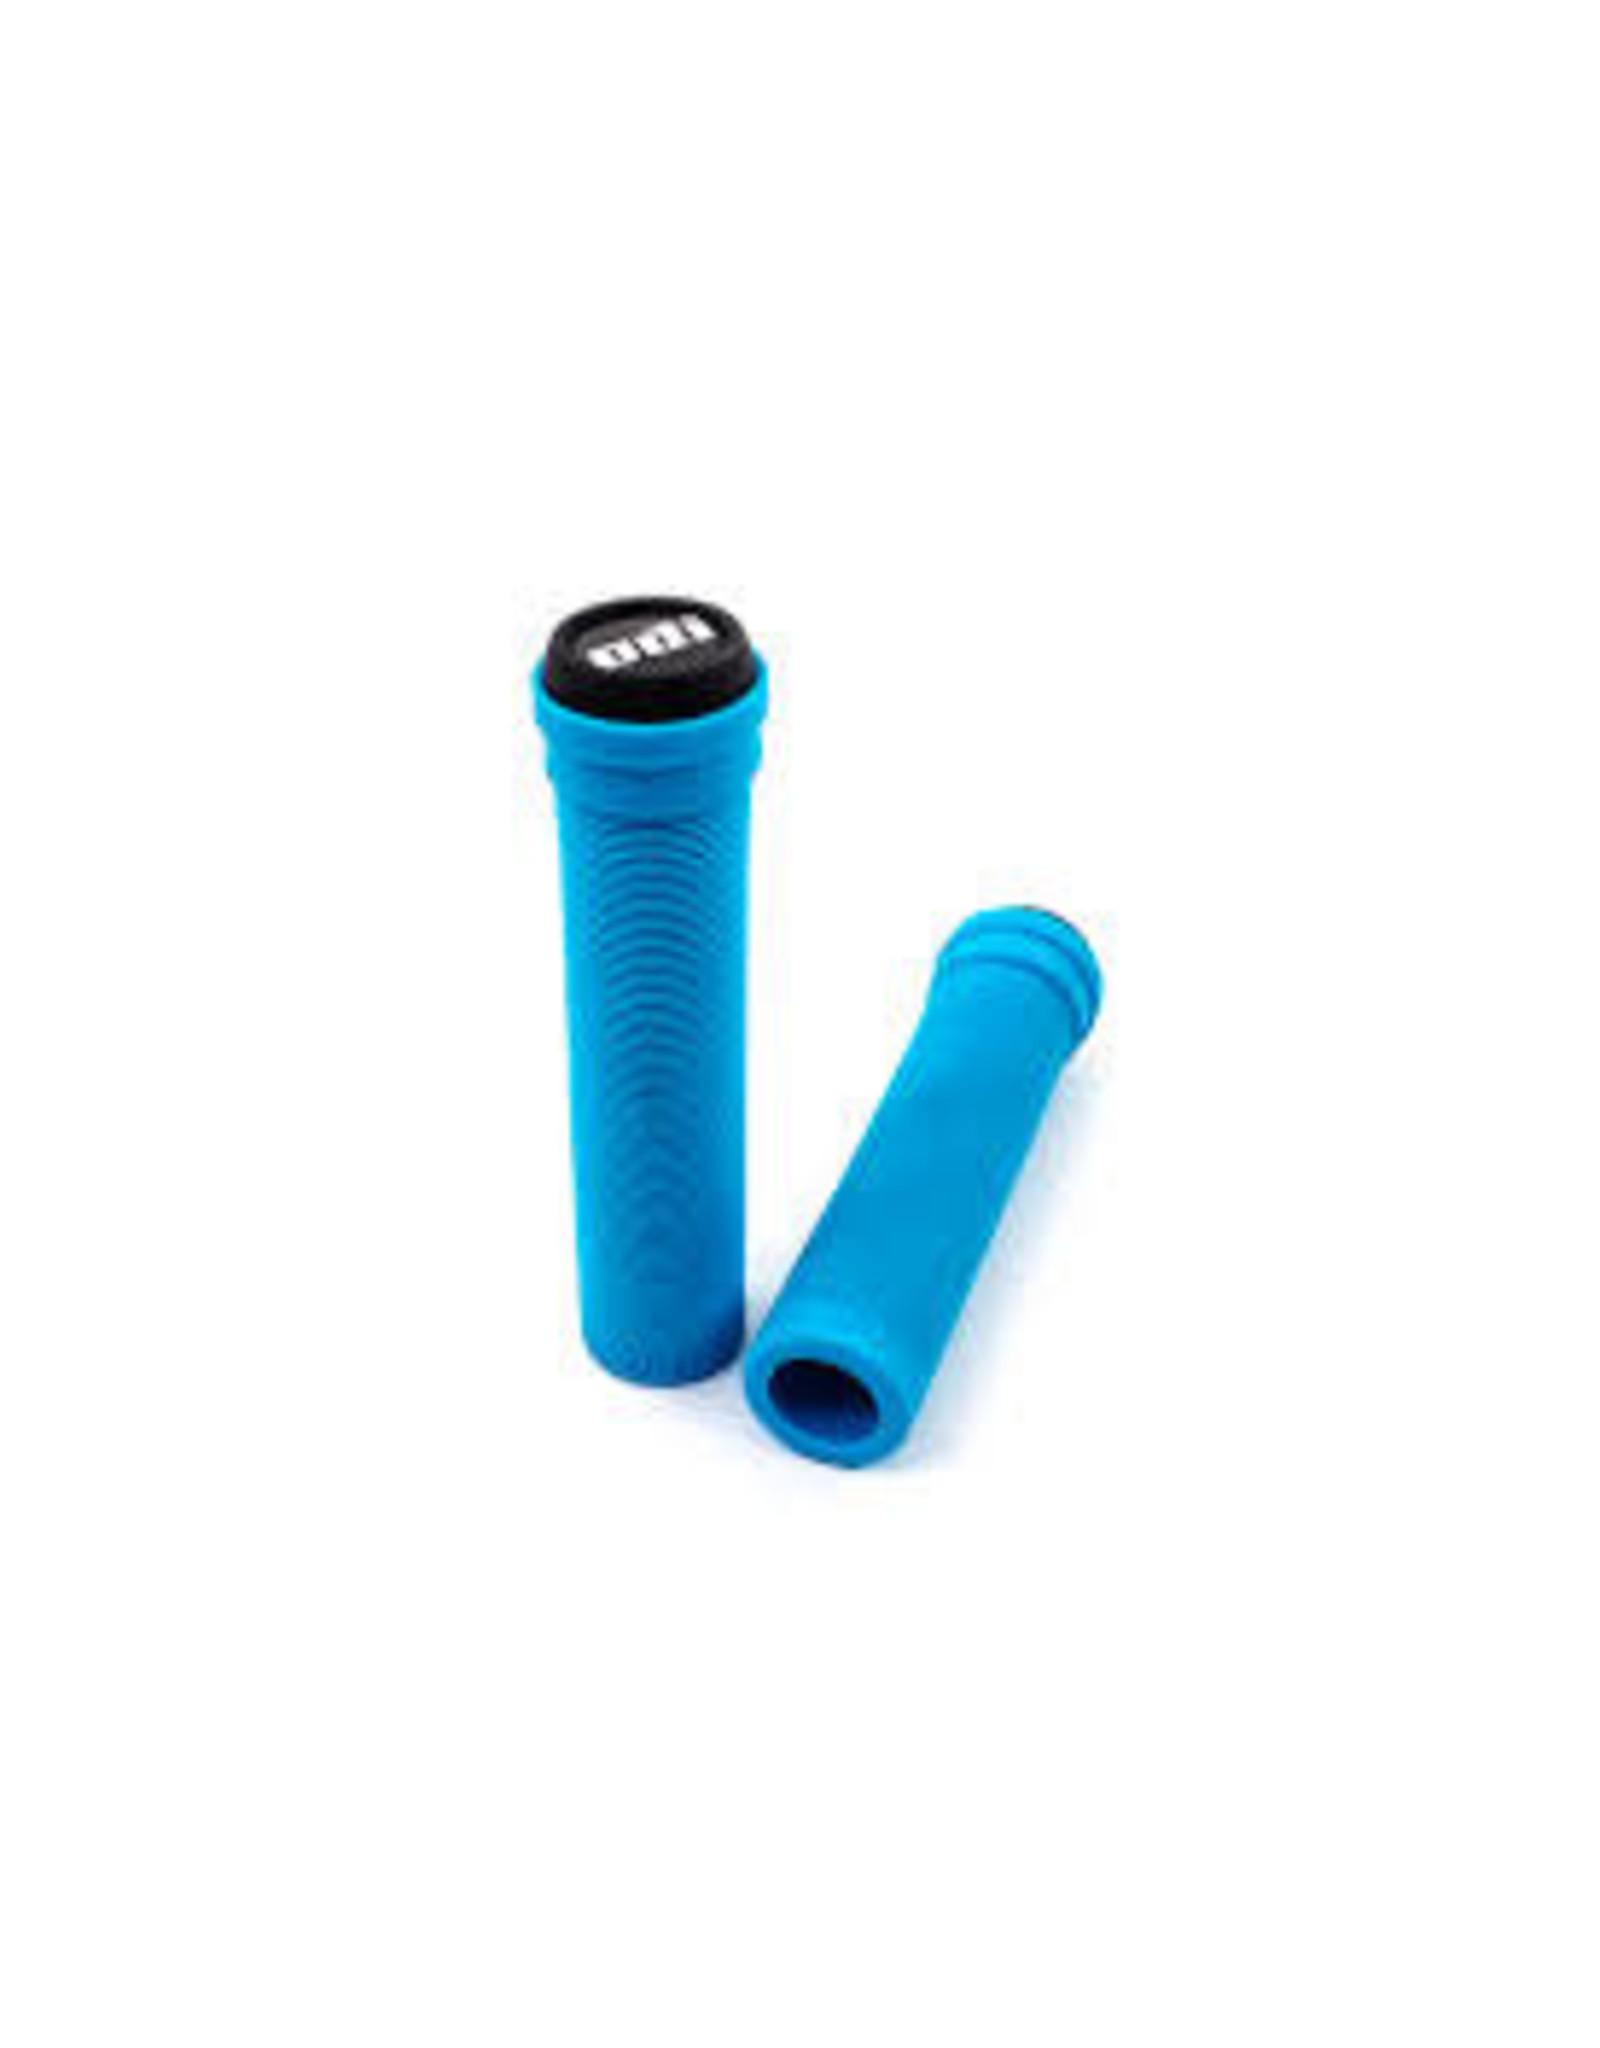 ODI Grip ODI Flangless Longneck Blu 135mm